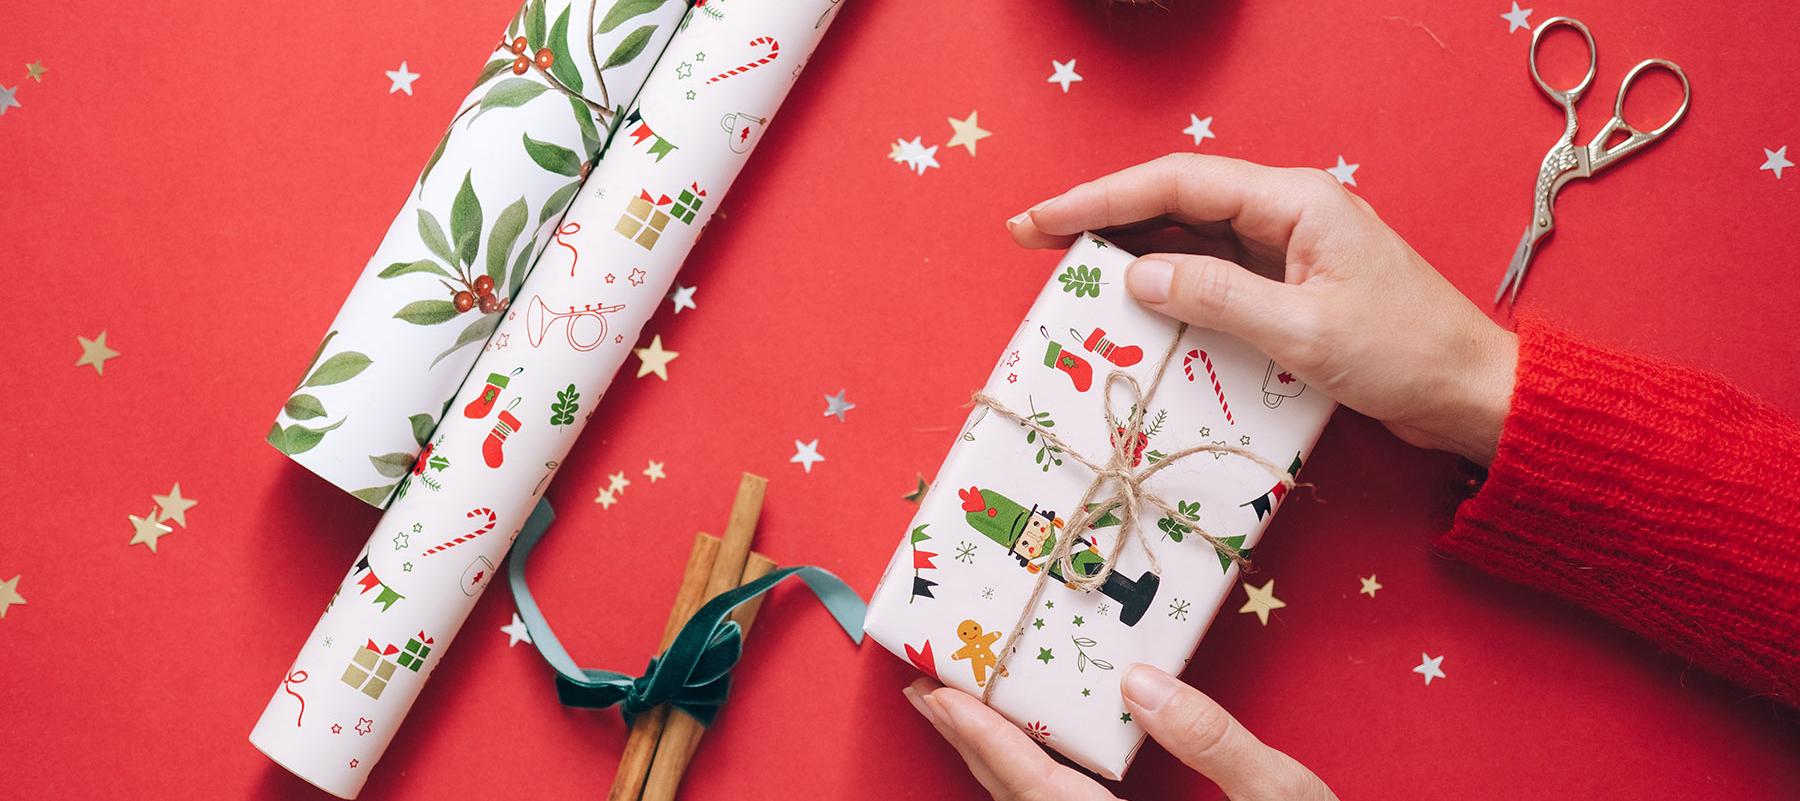 Christmas Edition: Senior Community Activity Ideas